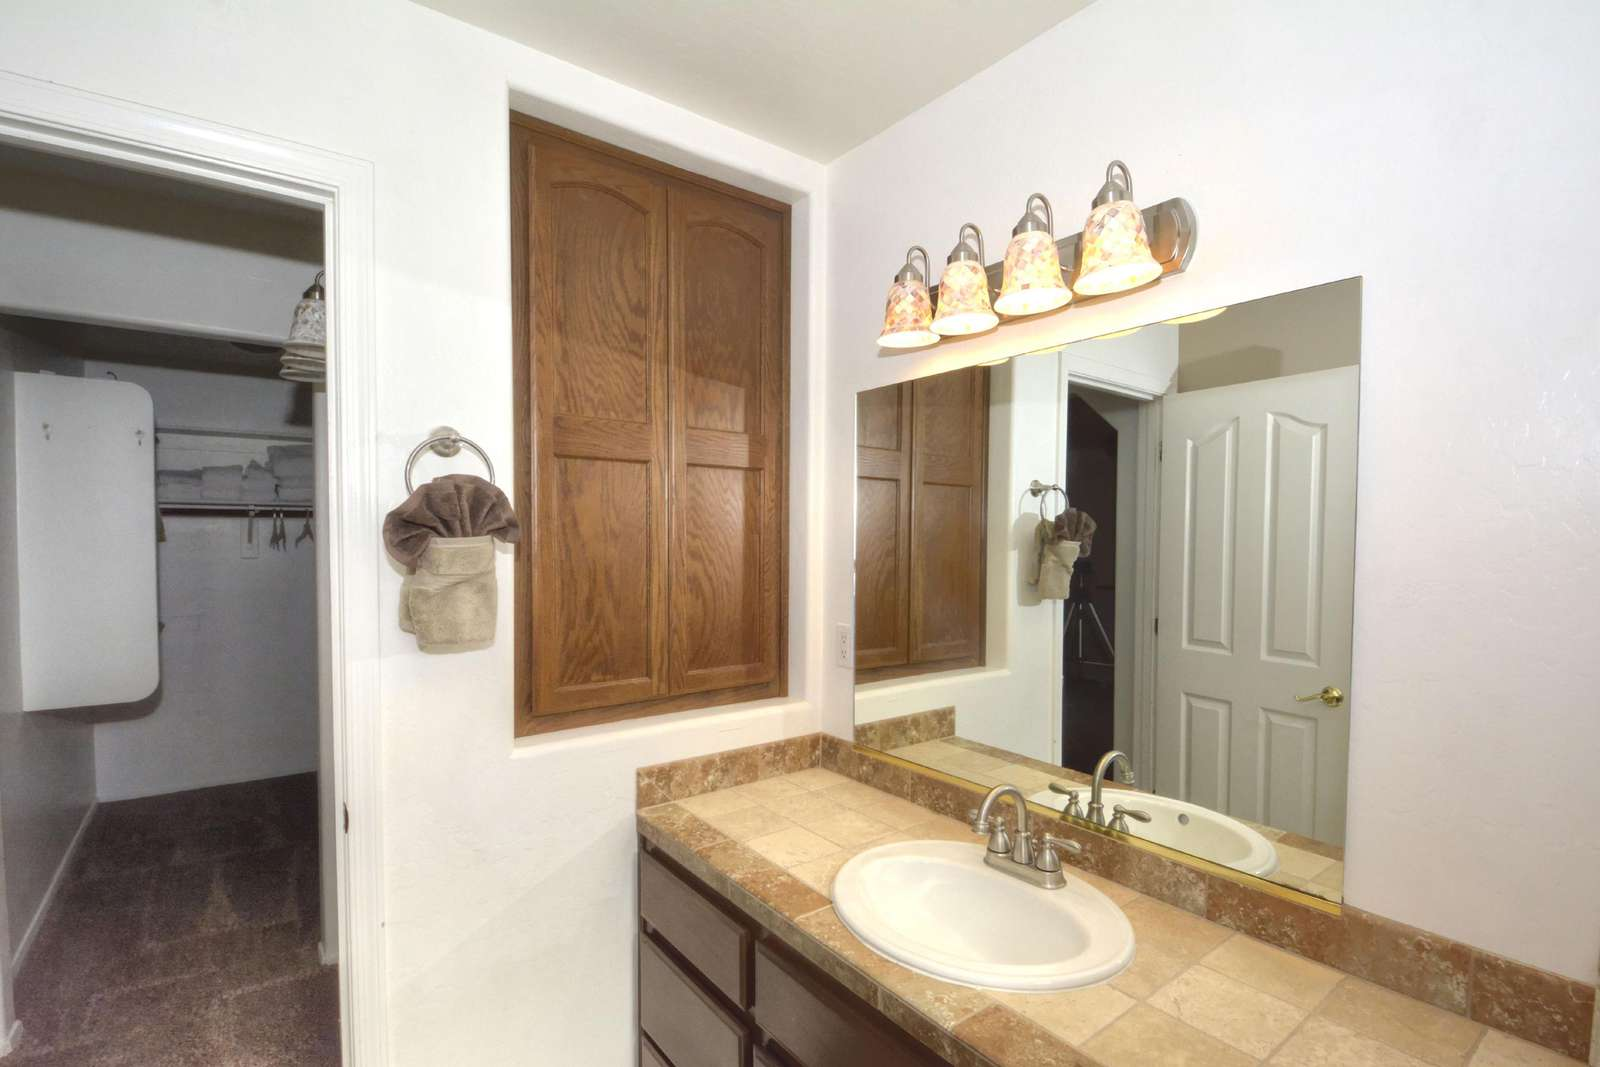 Mstr vanity and closet